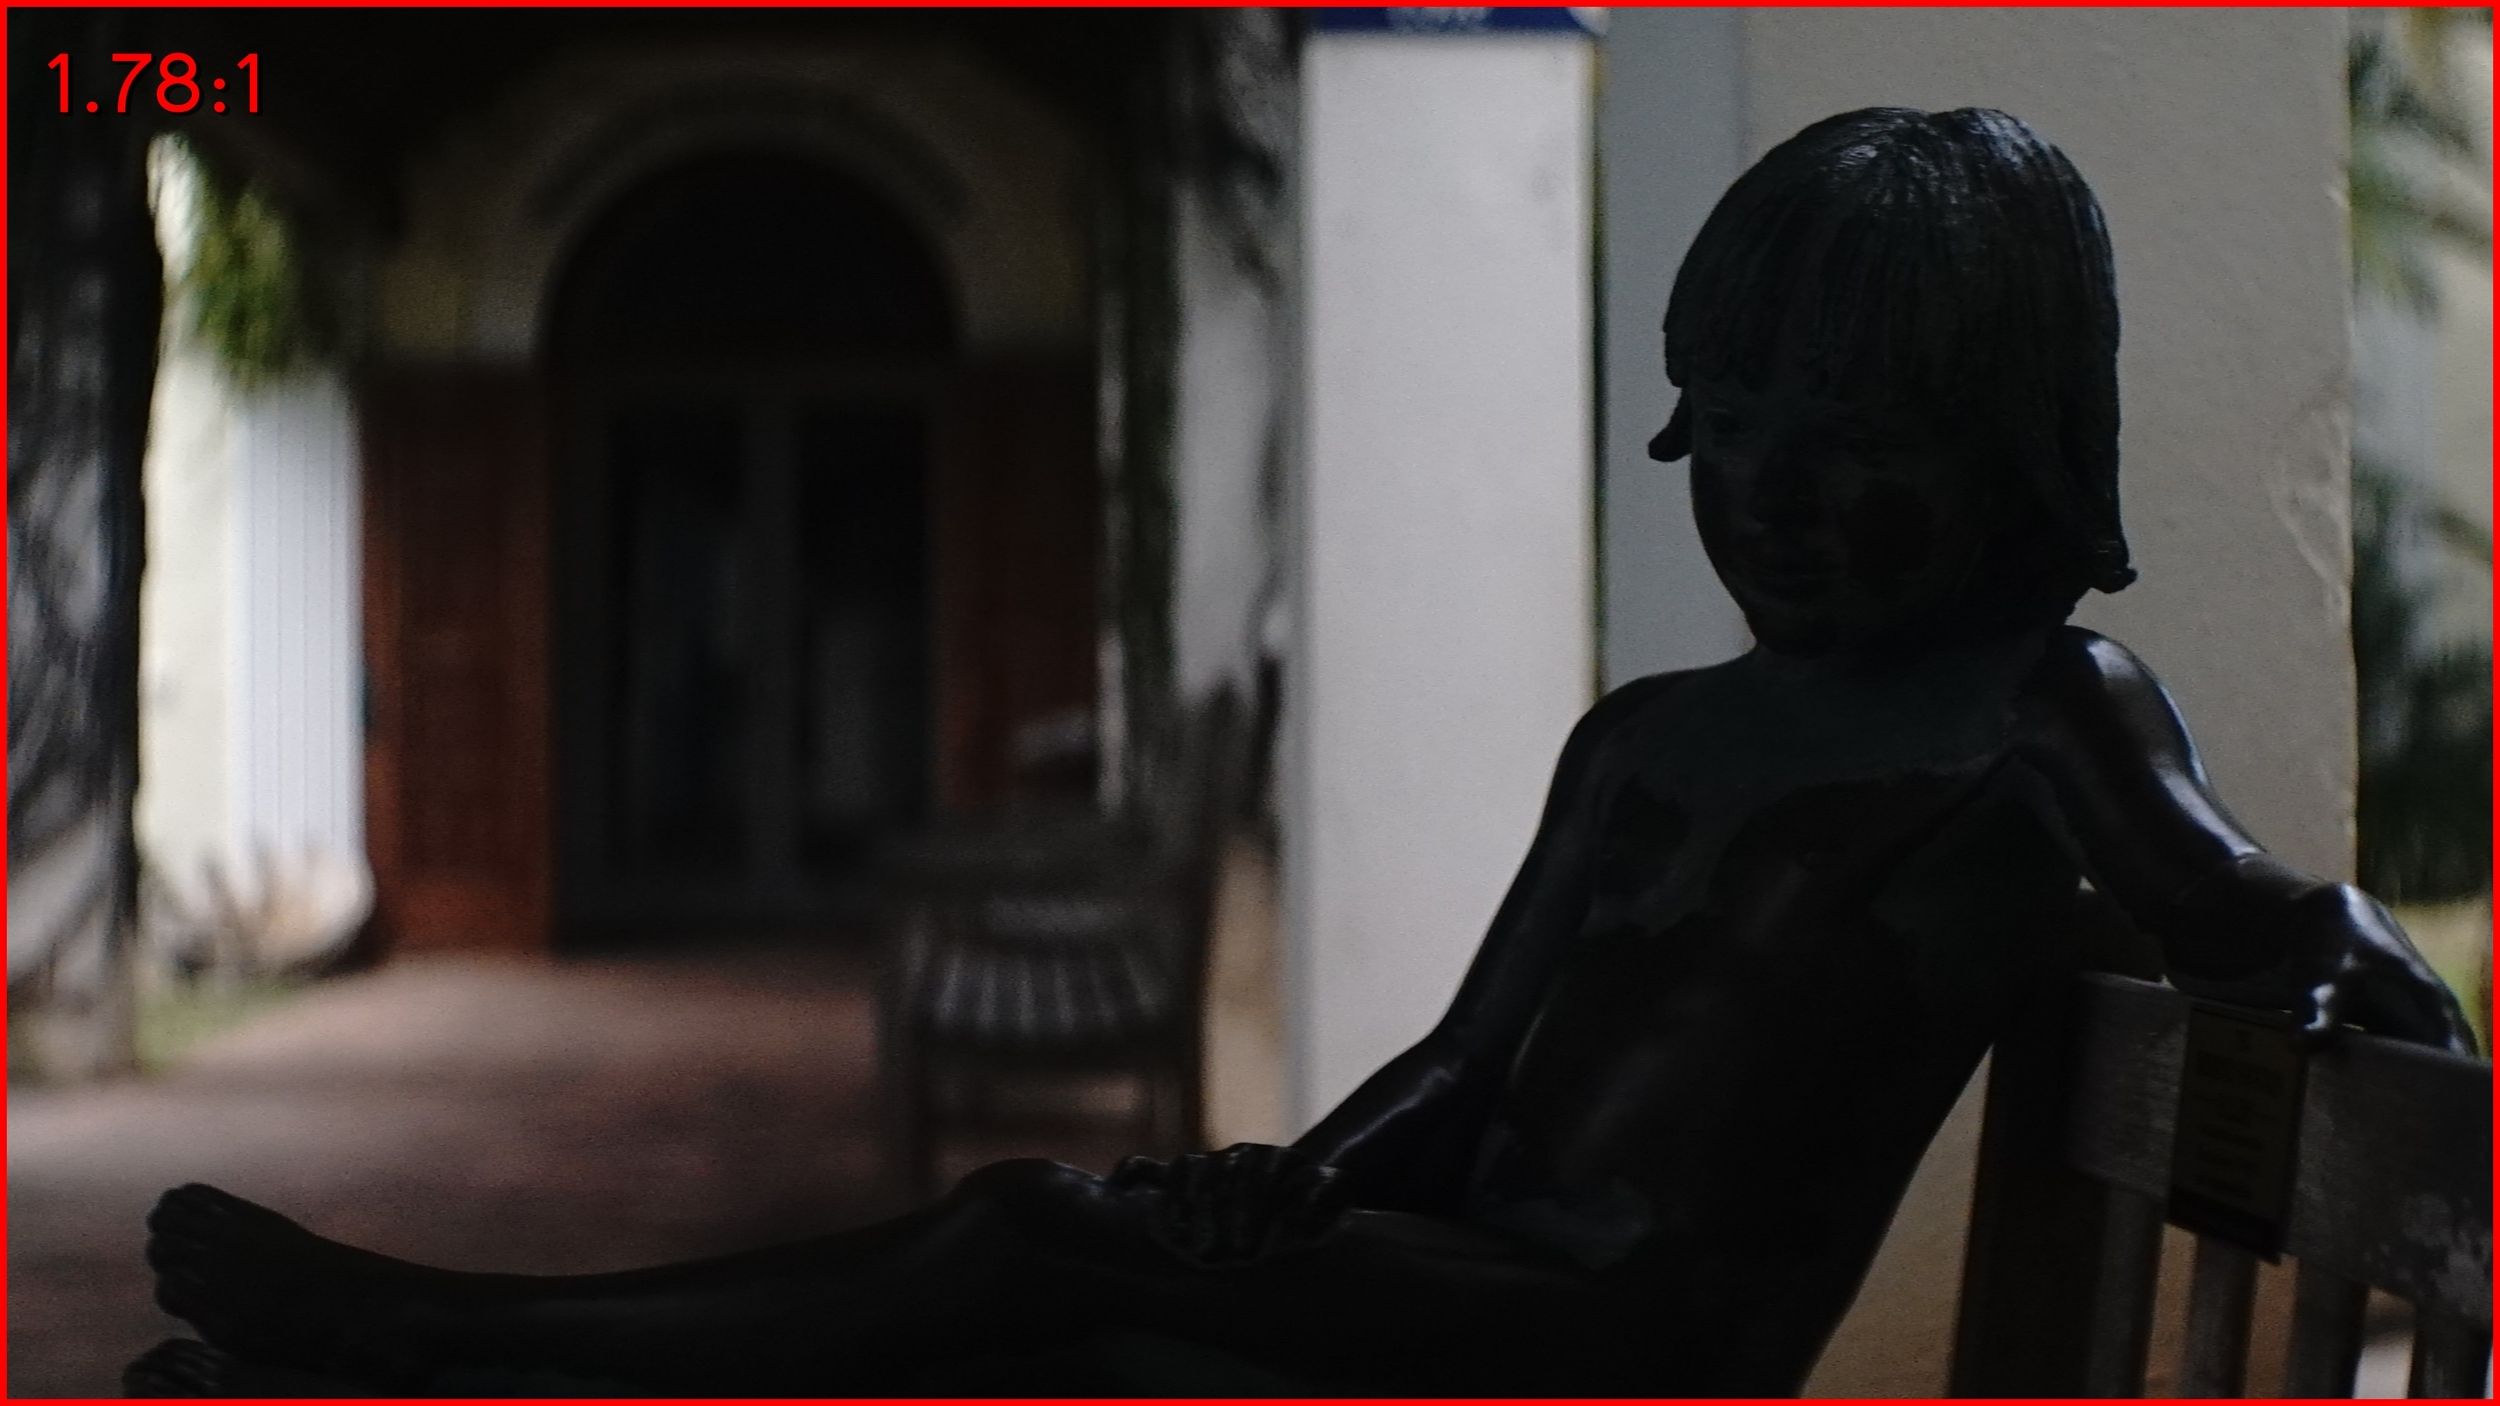 Statue_1.78_RED.JPG